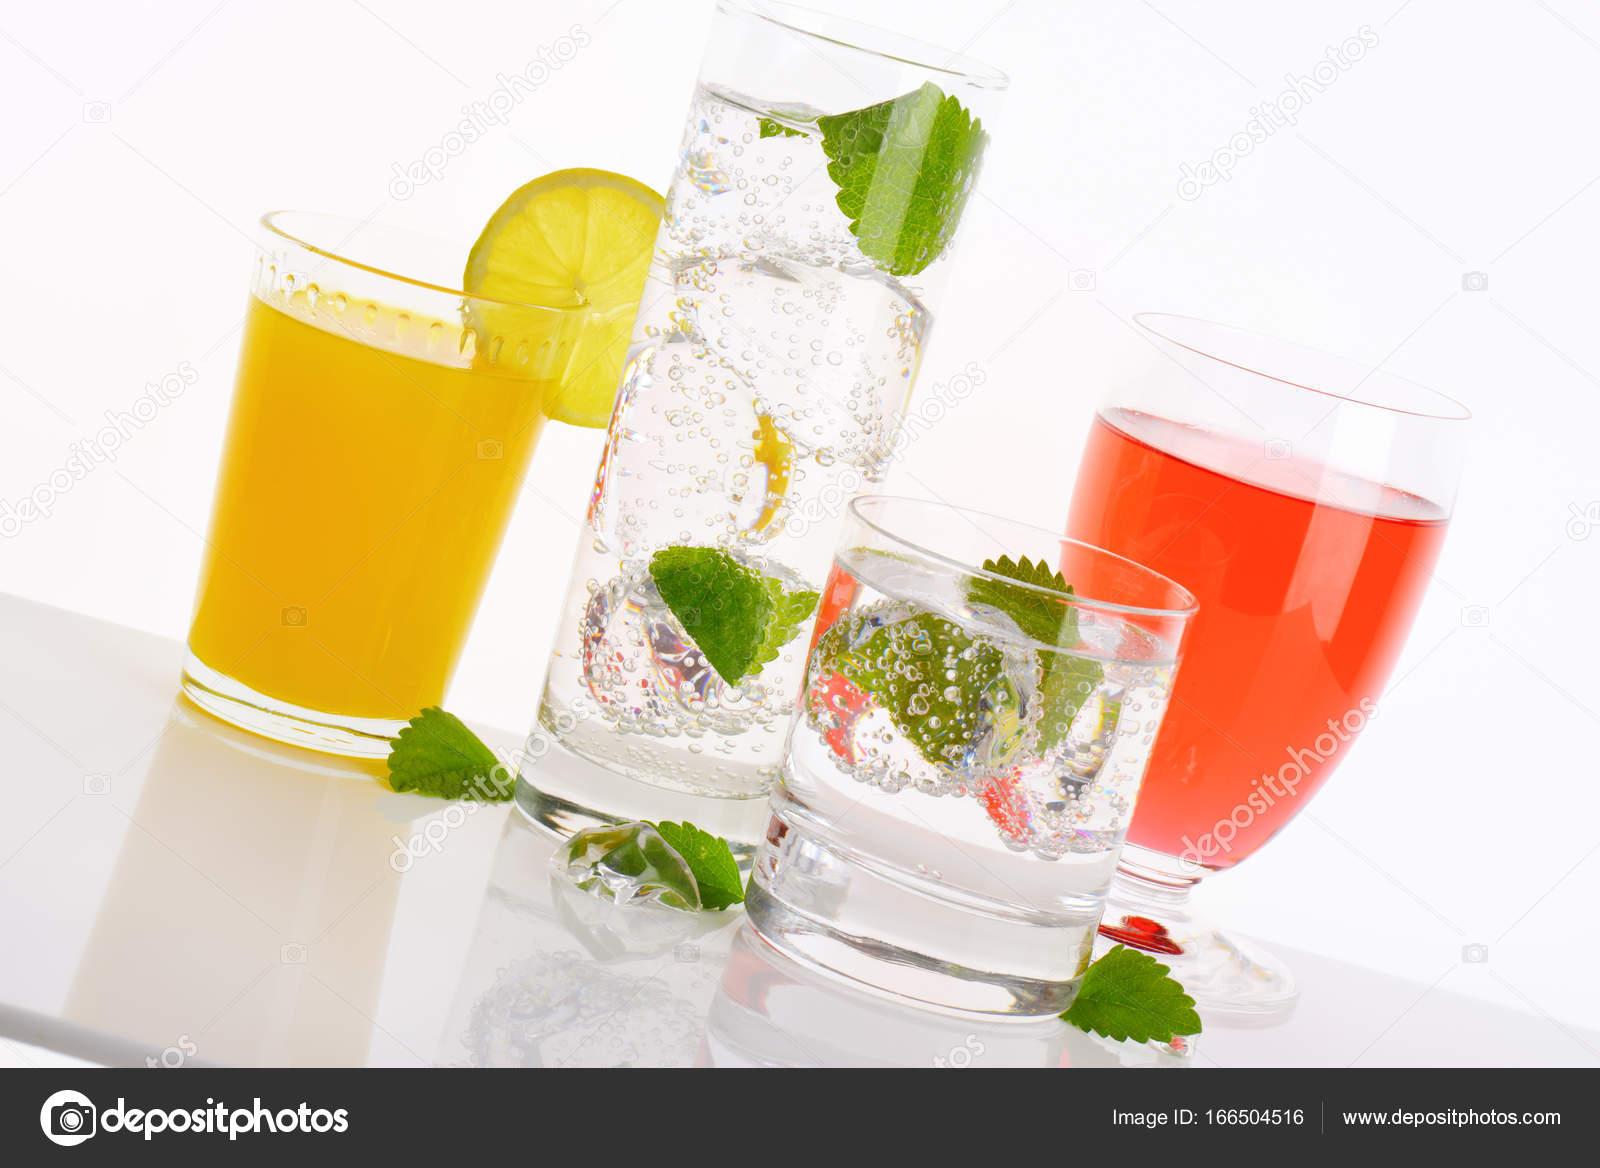 Sommer kalte Getränke — Stockfoto © ajafoto #166504516